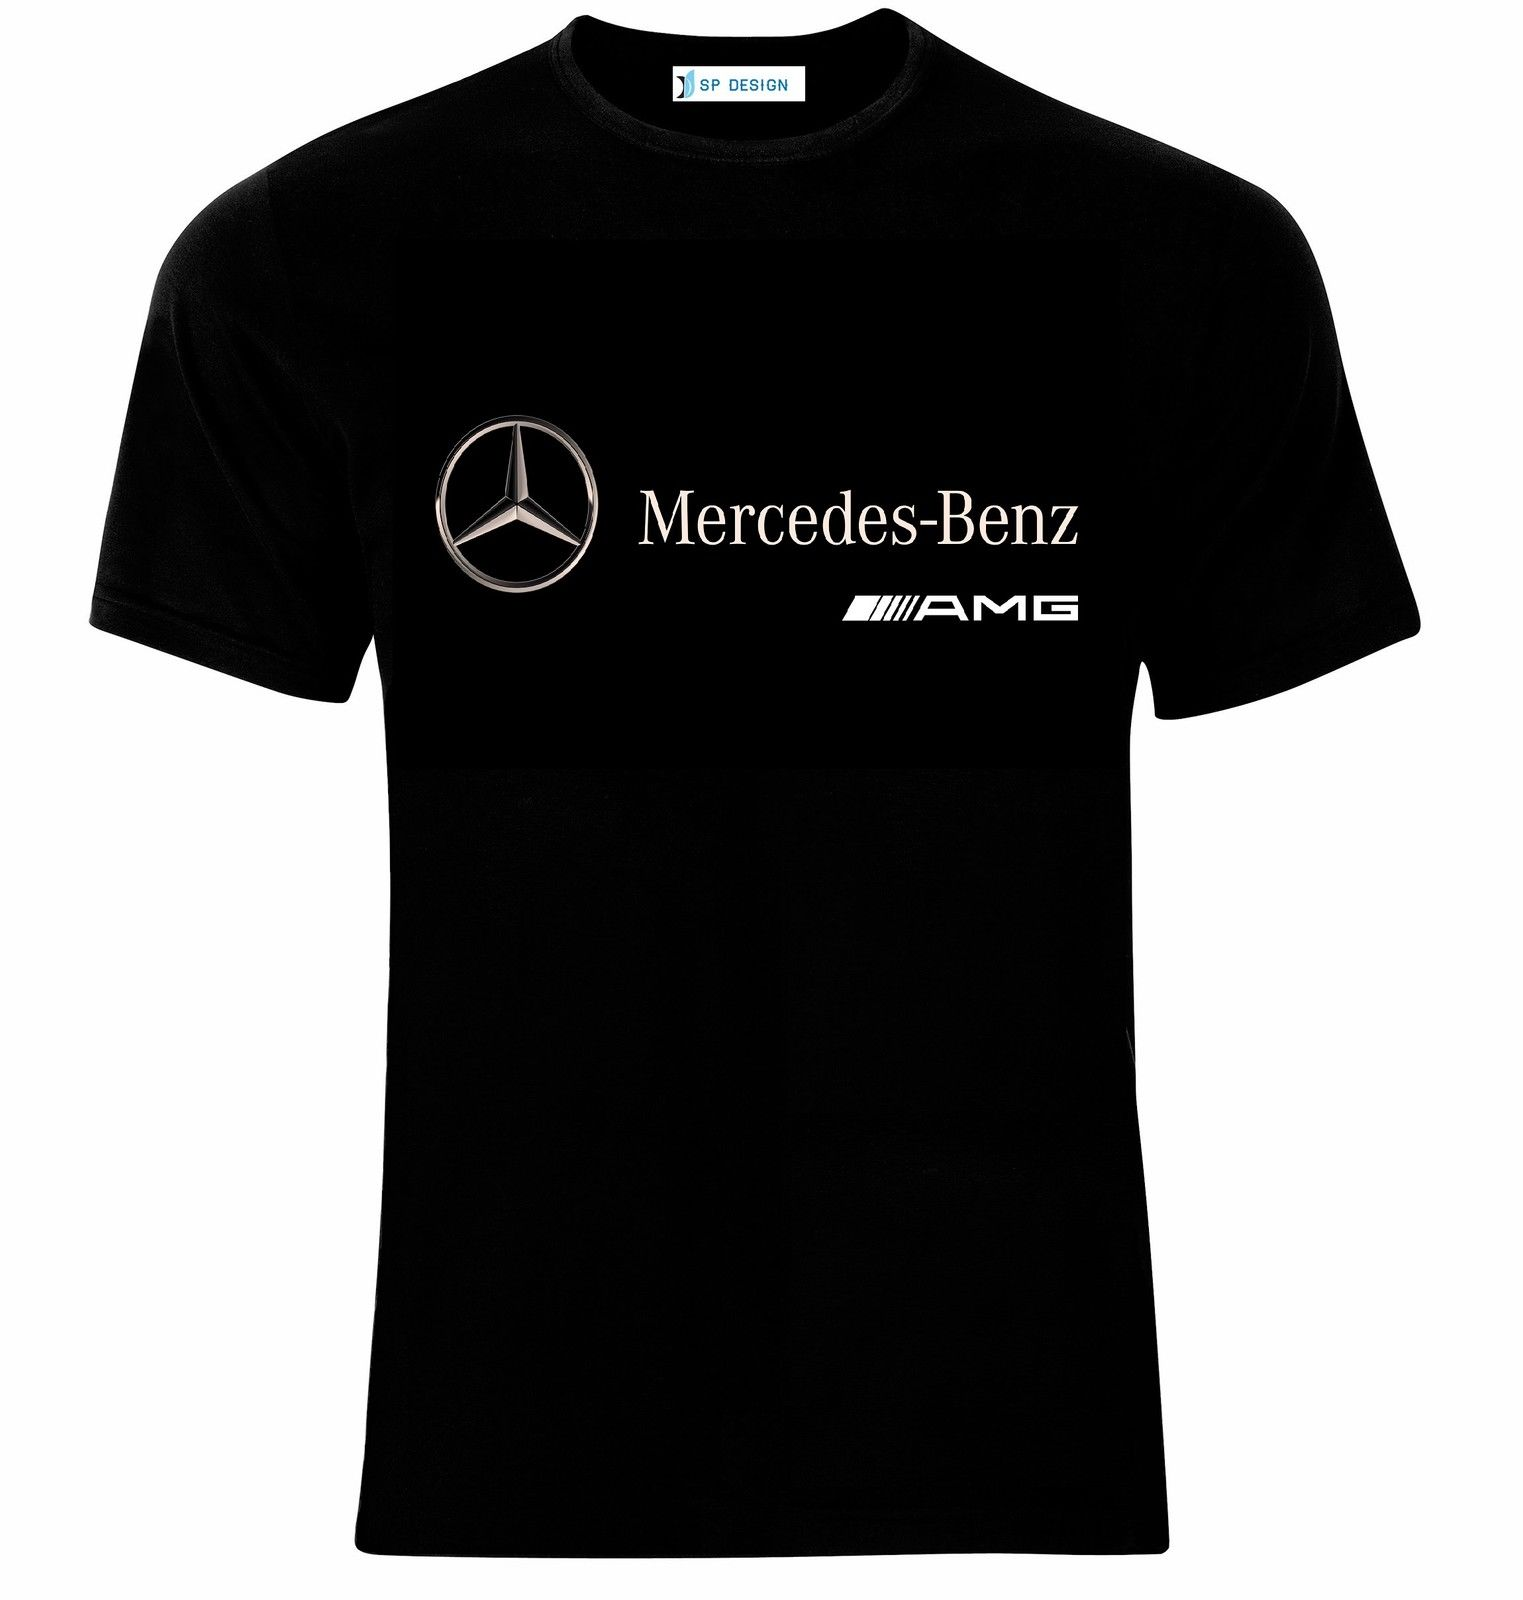 mercedes benz amg logo auto cars manner printed t shirt. Black Bedroom Furniture Sets. Home Design Ideas